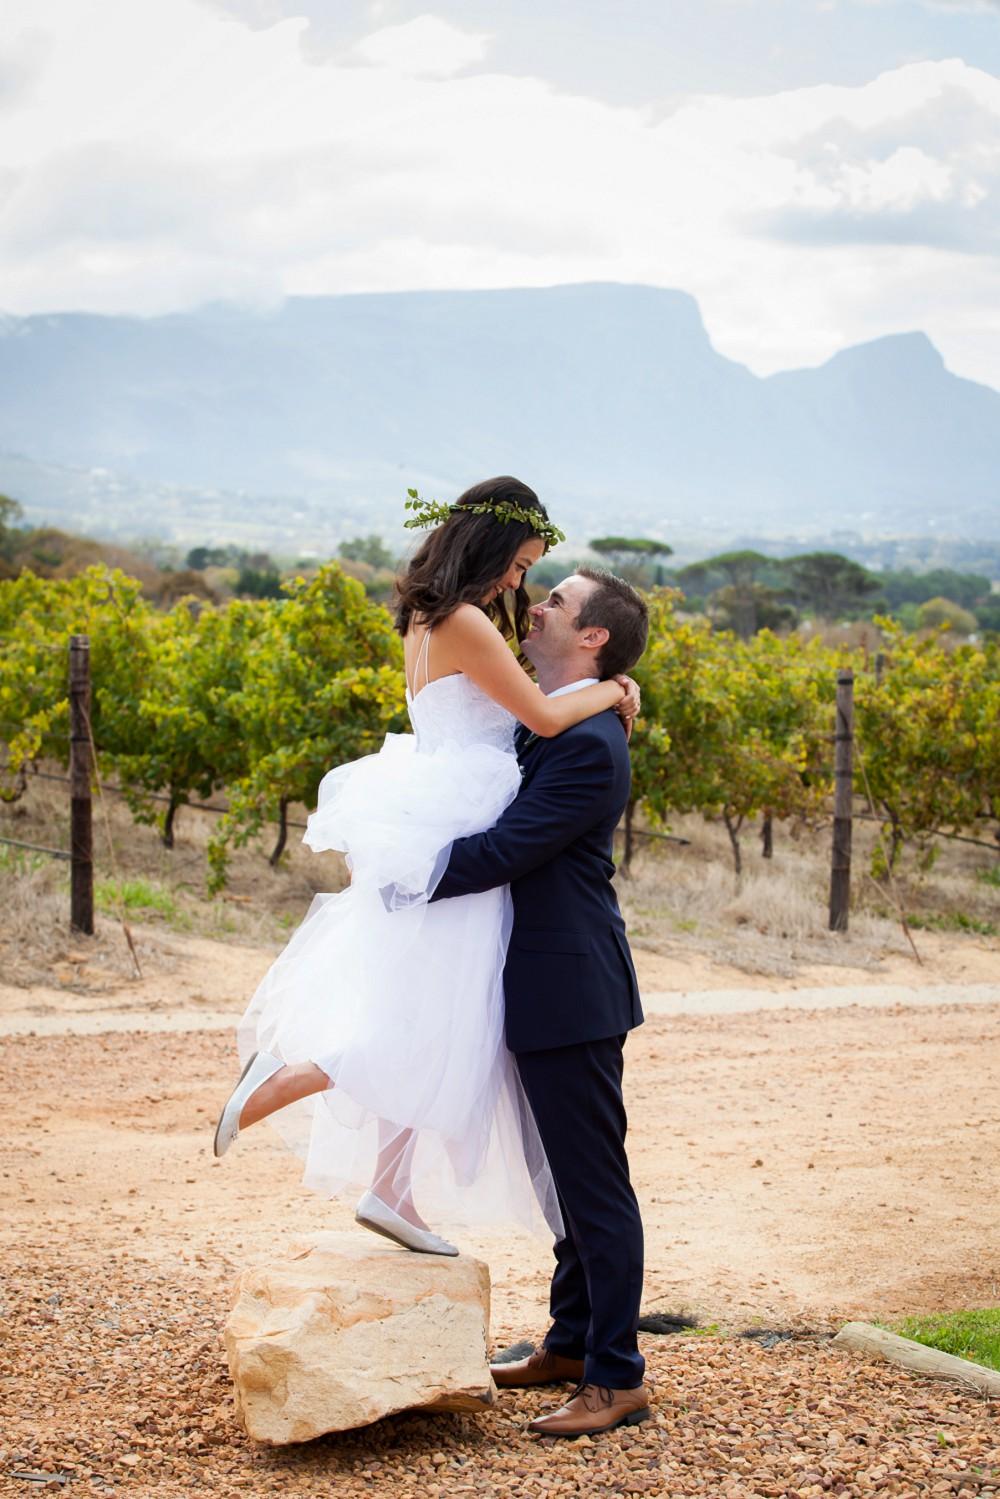 Catharinas Wedding Photography 129